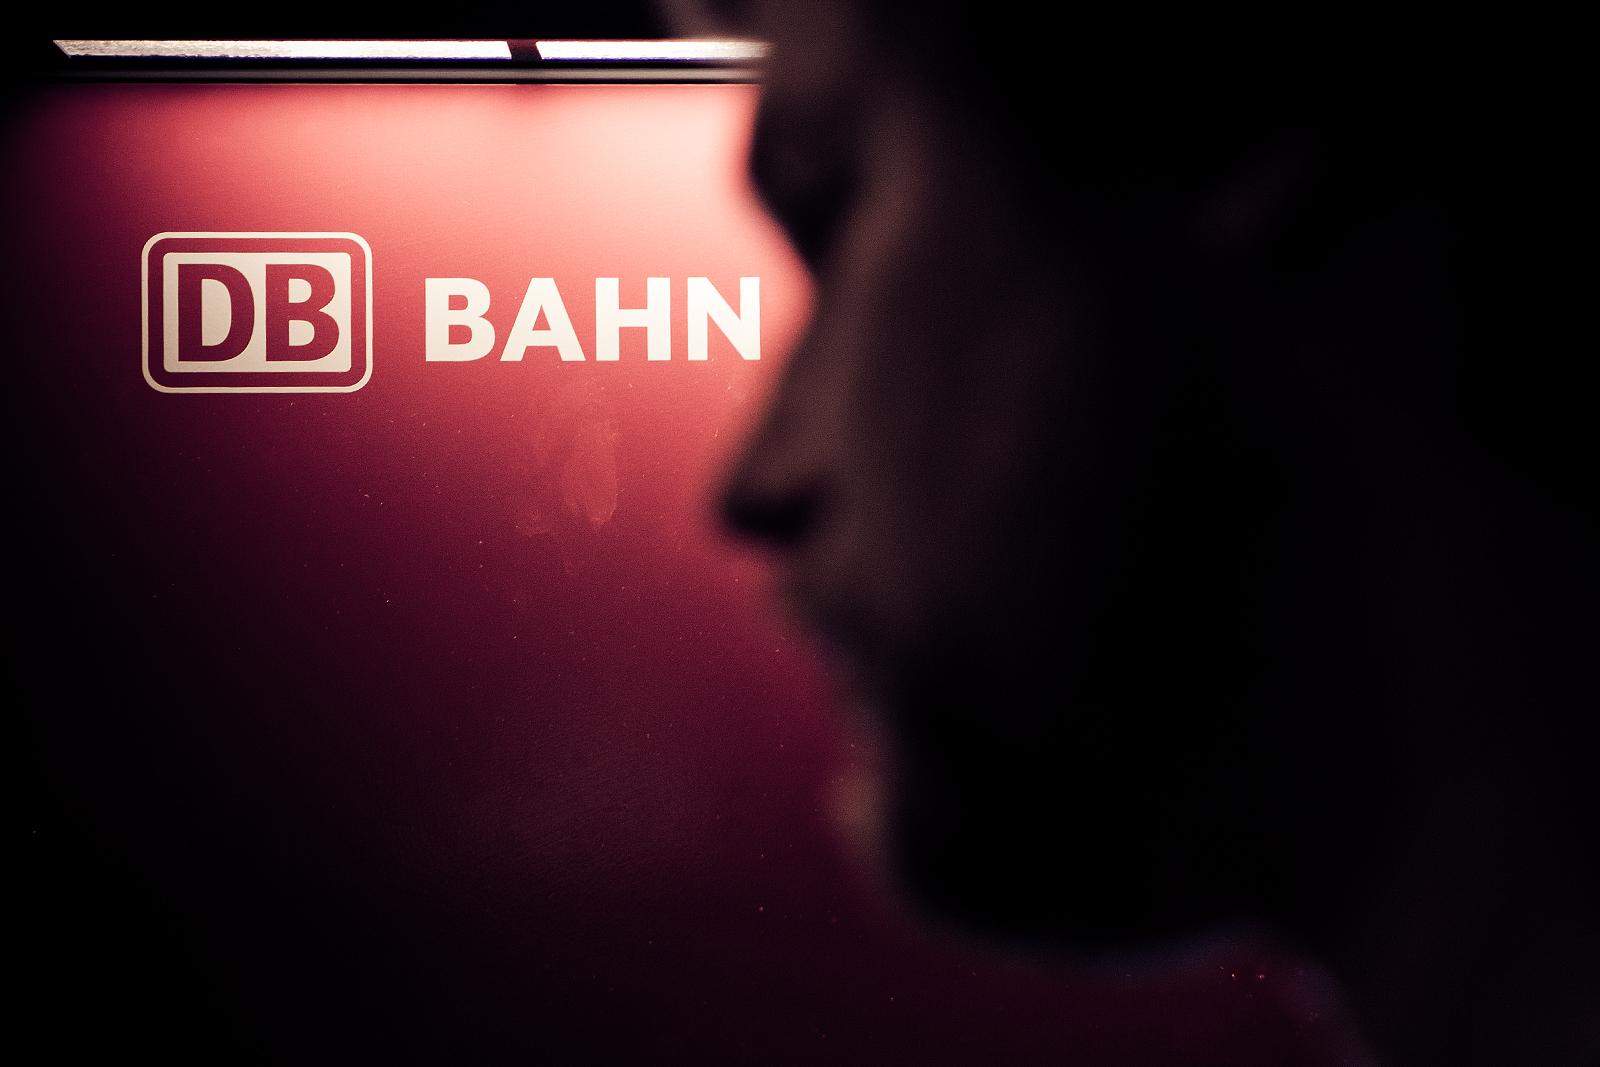 berlin_0030_Layer 4